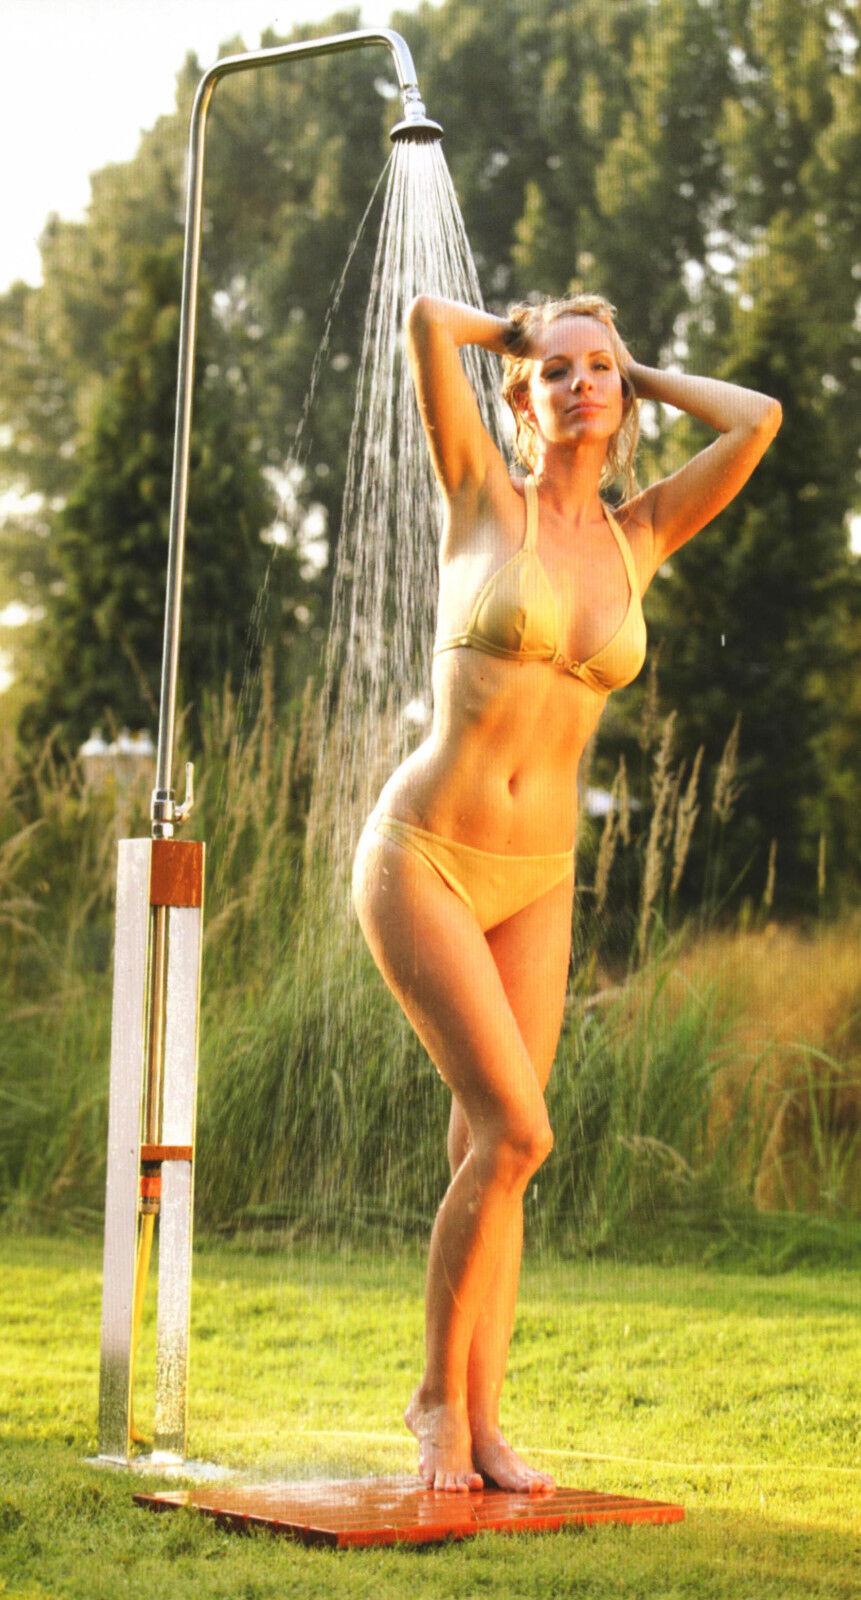 Gartendusche Altena Pooldusche Dusche Edelstahldusche Außendusche Shower